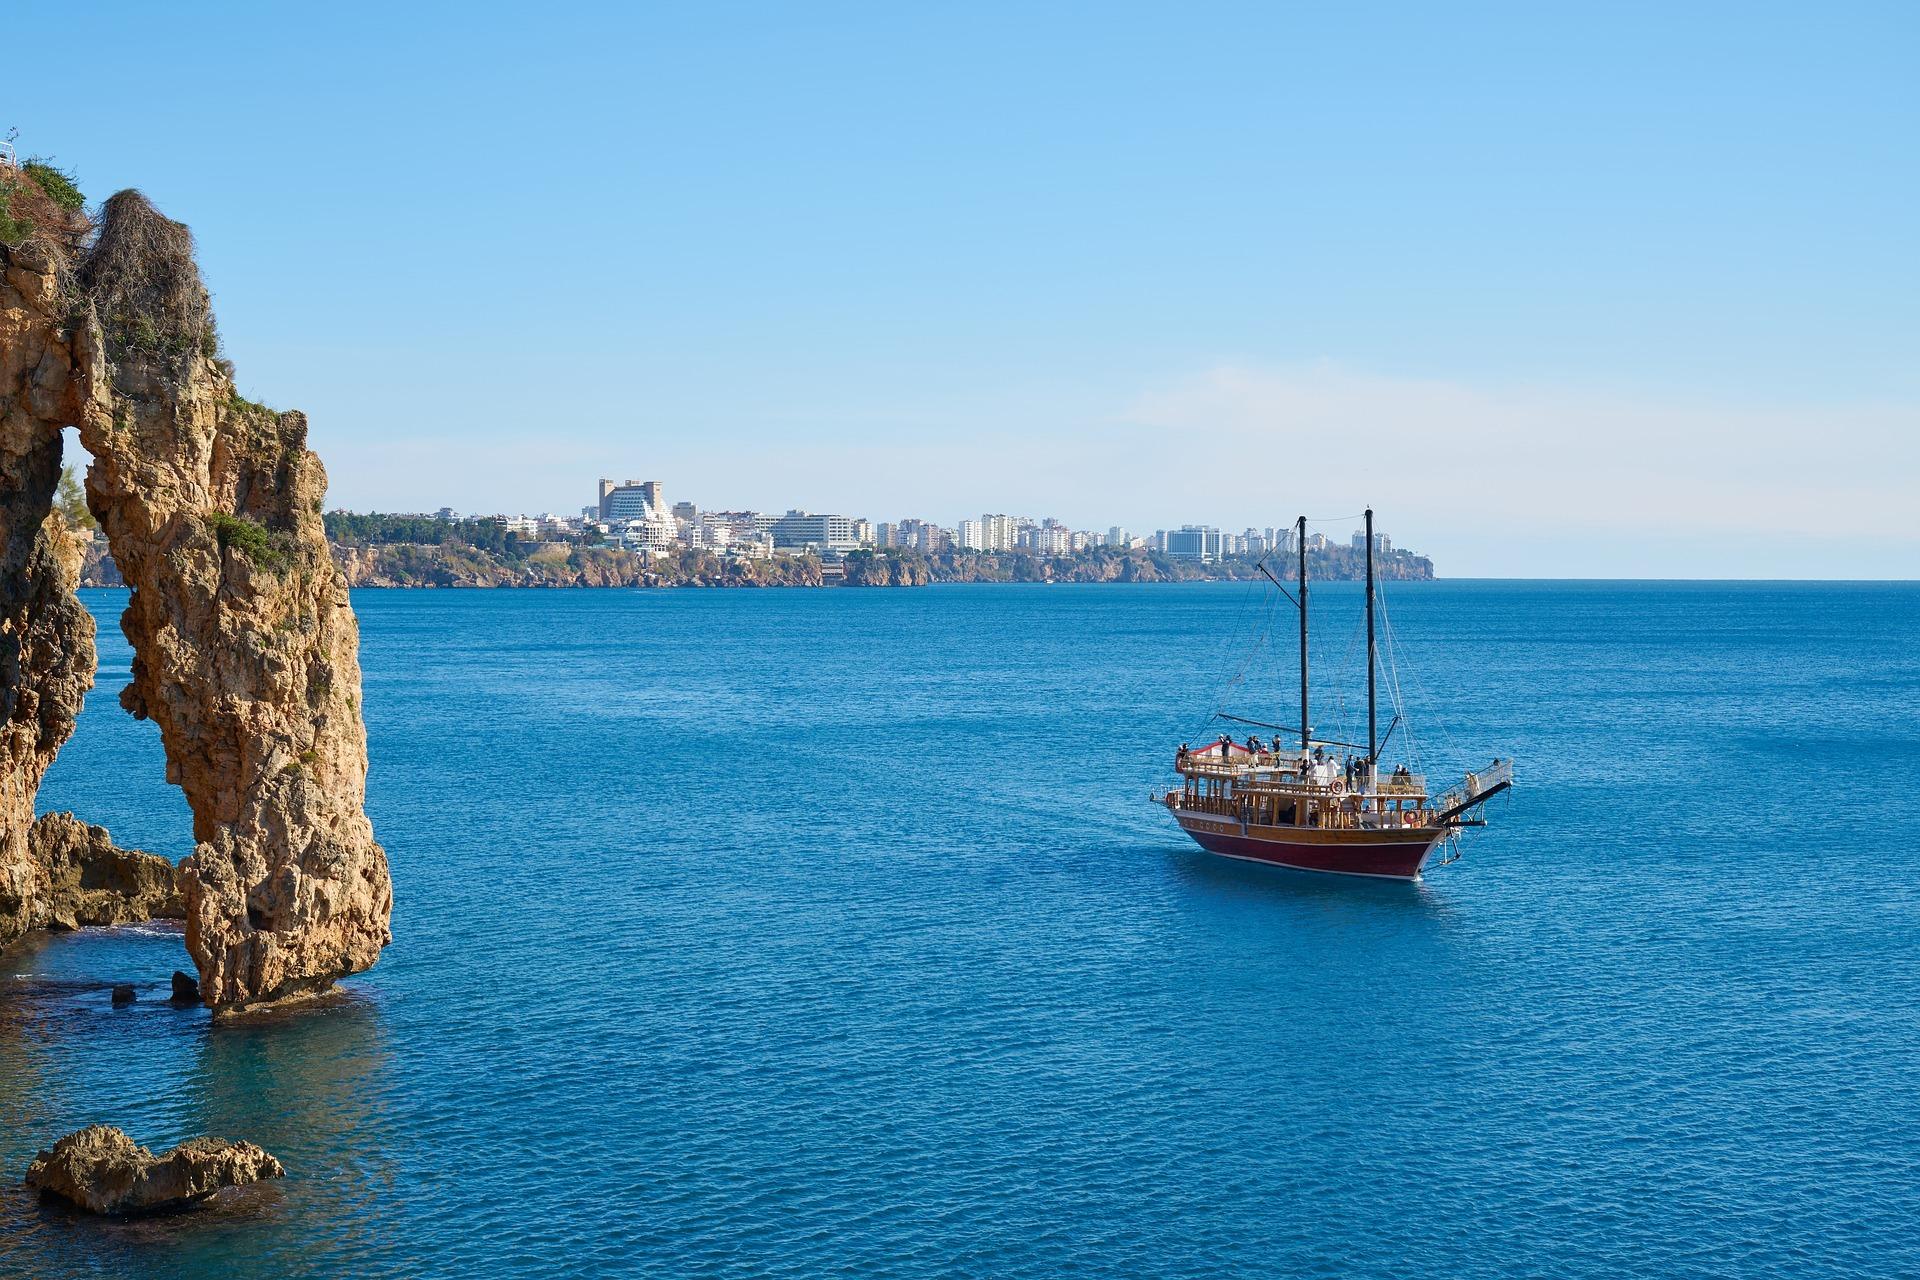 Türkei Urlaub Corona 2021 | Angebote & Aktuelles